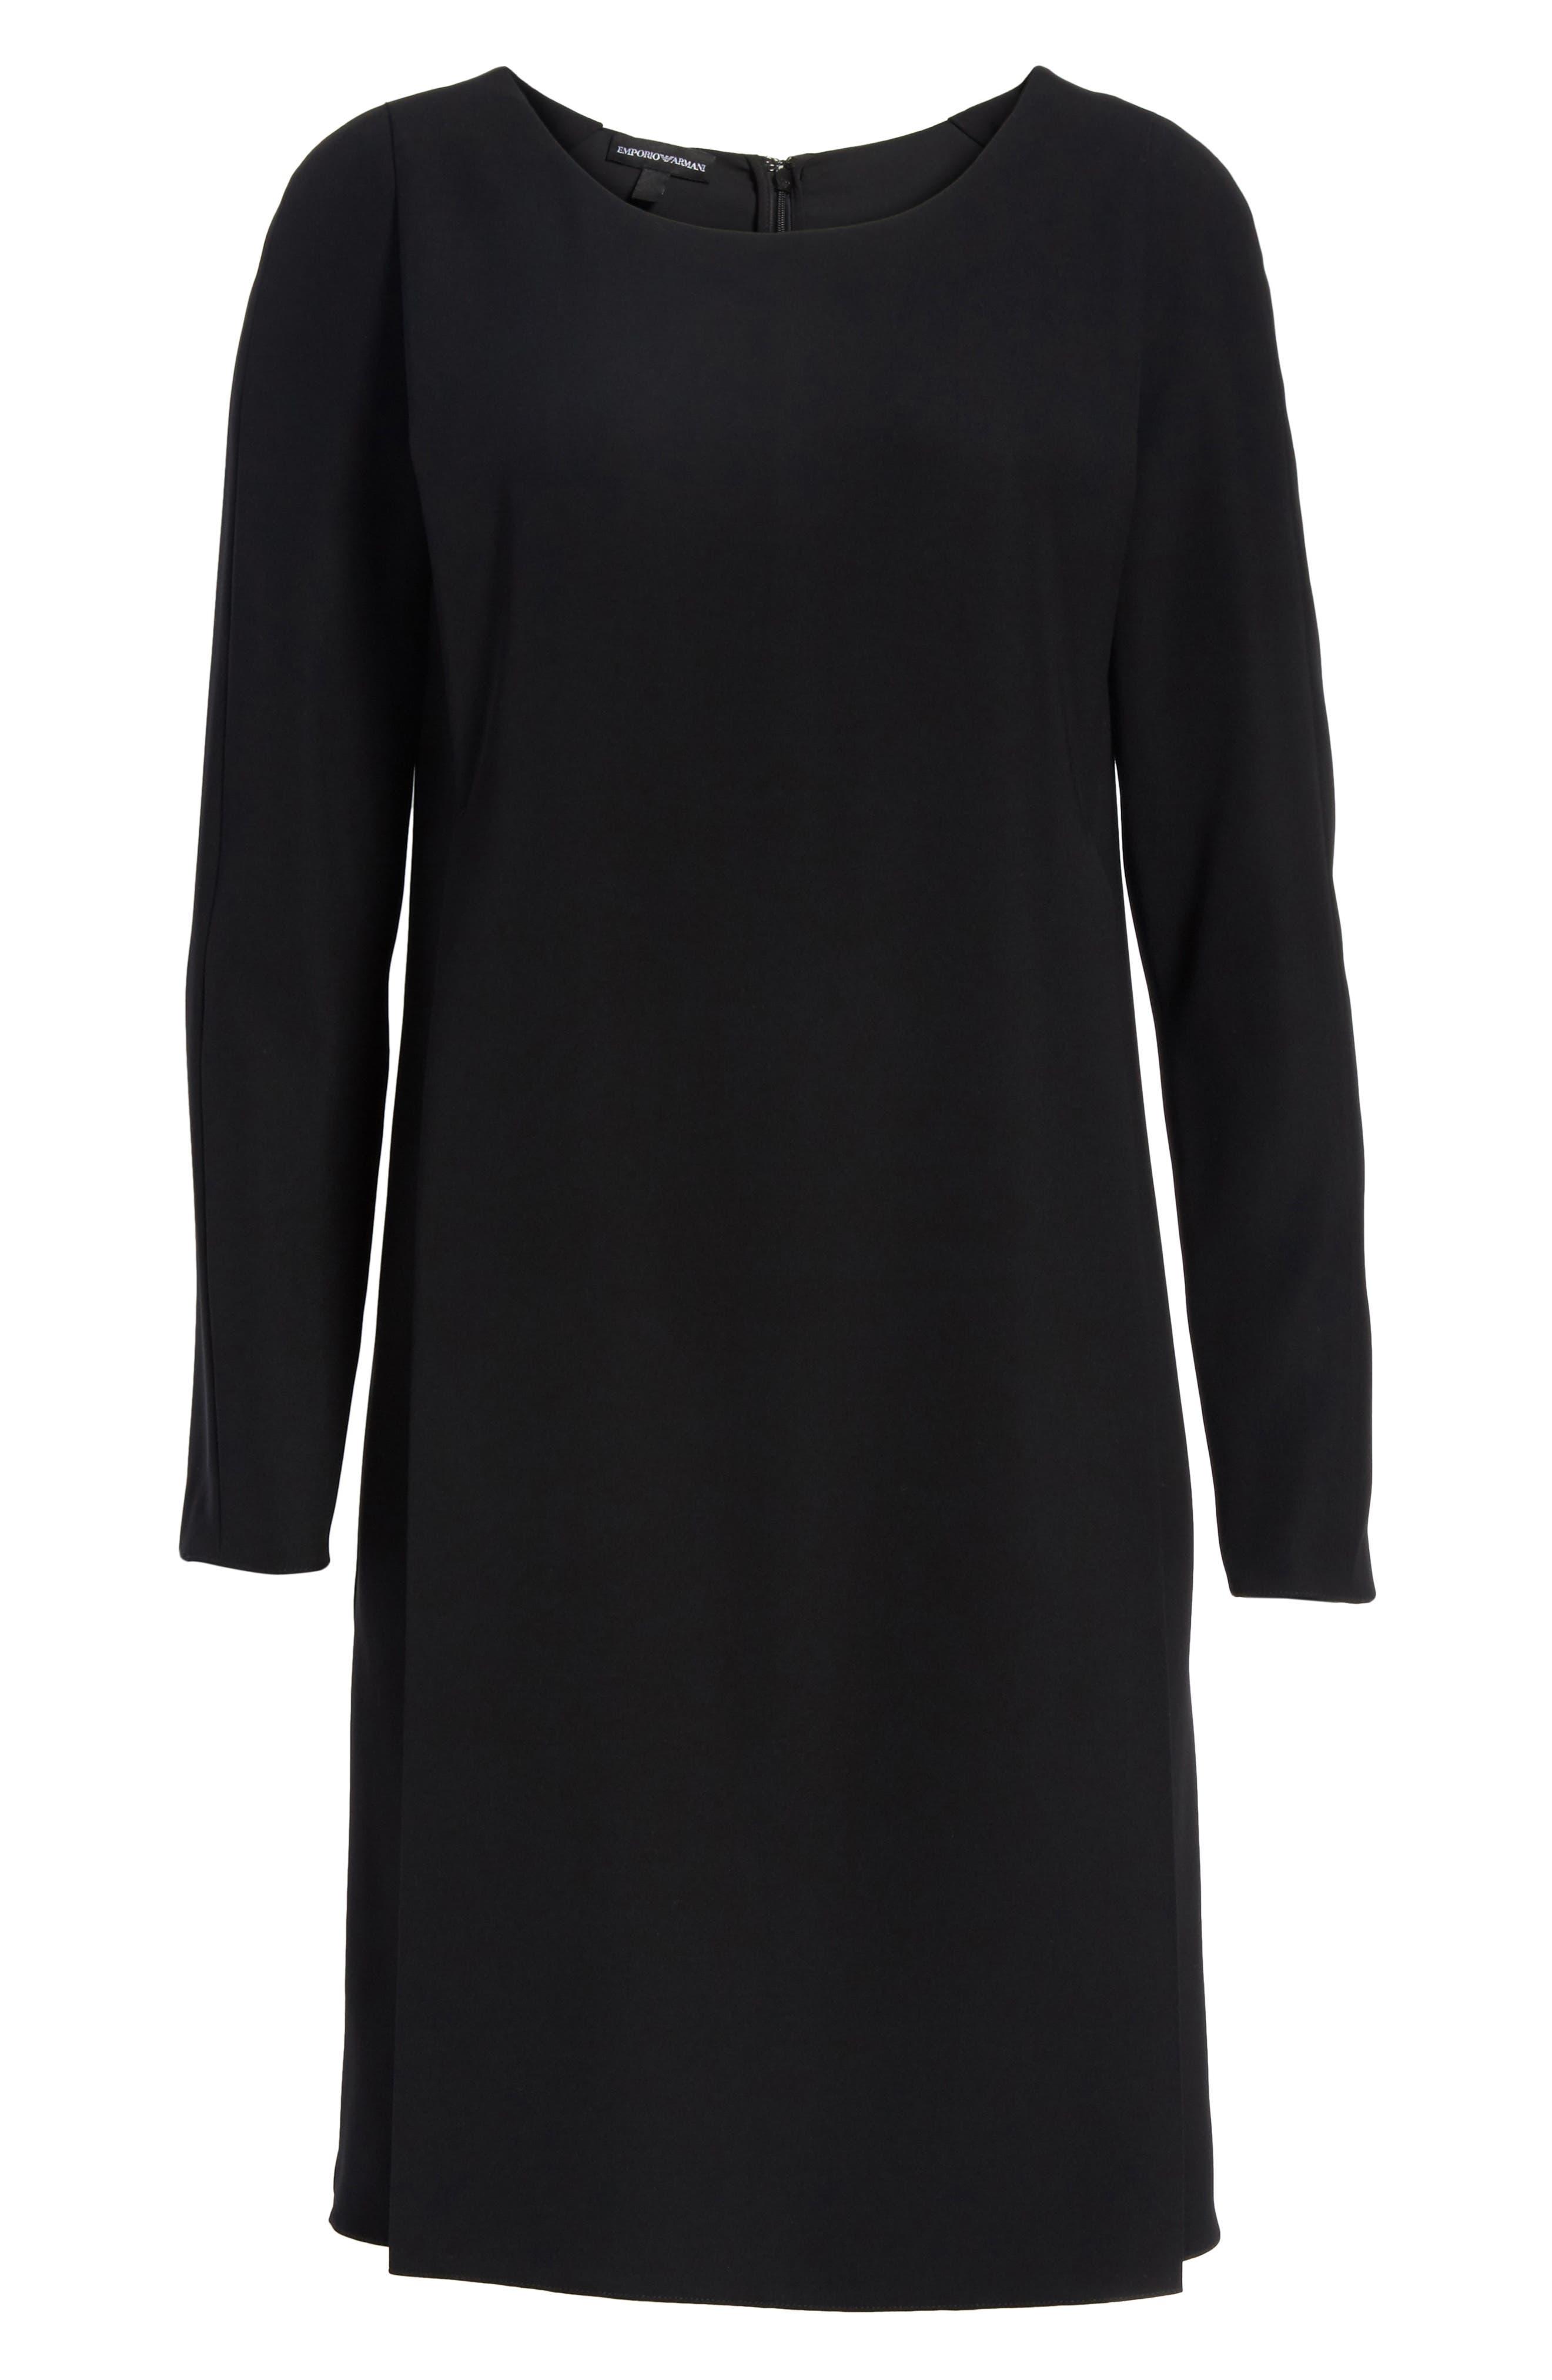 EMPORIO ARMANI,                             Draped Cady Shift Dress,                             Alternate thumbnail 6, color,                             004